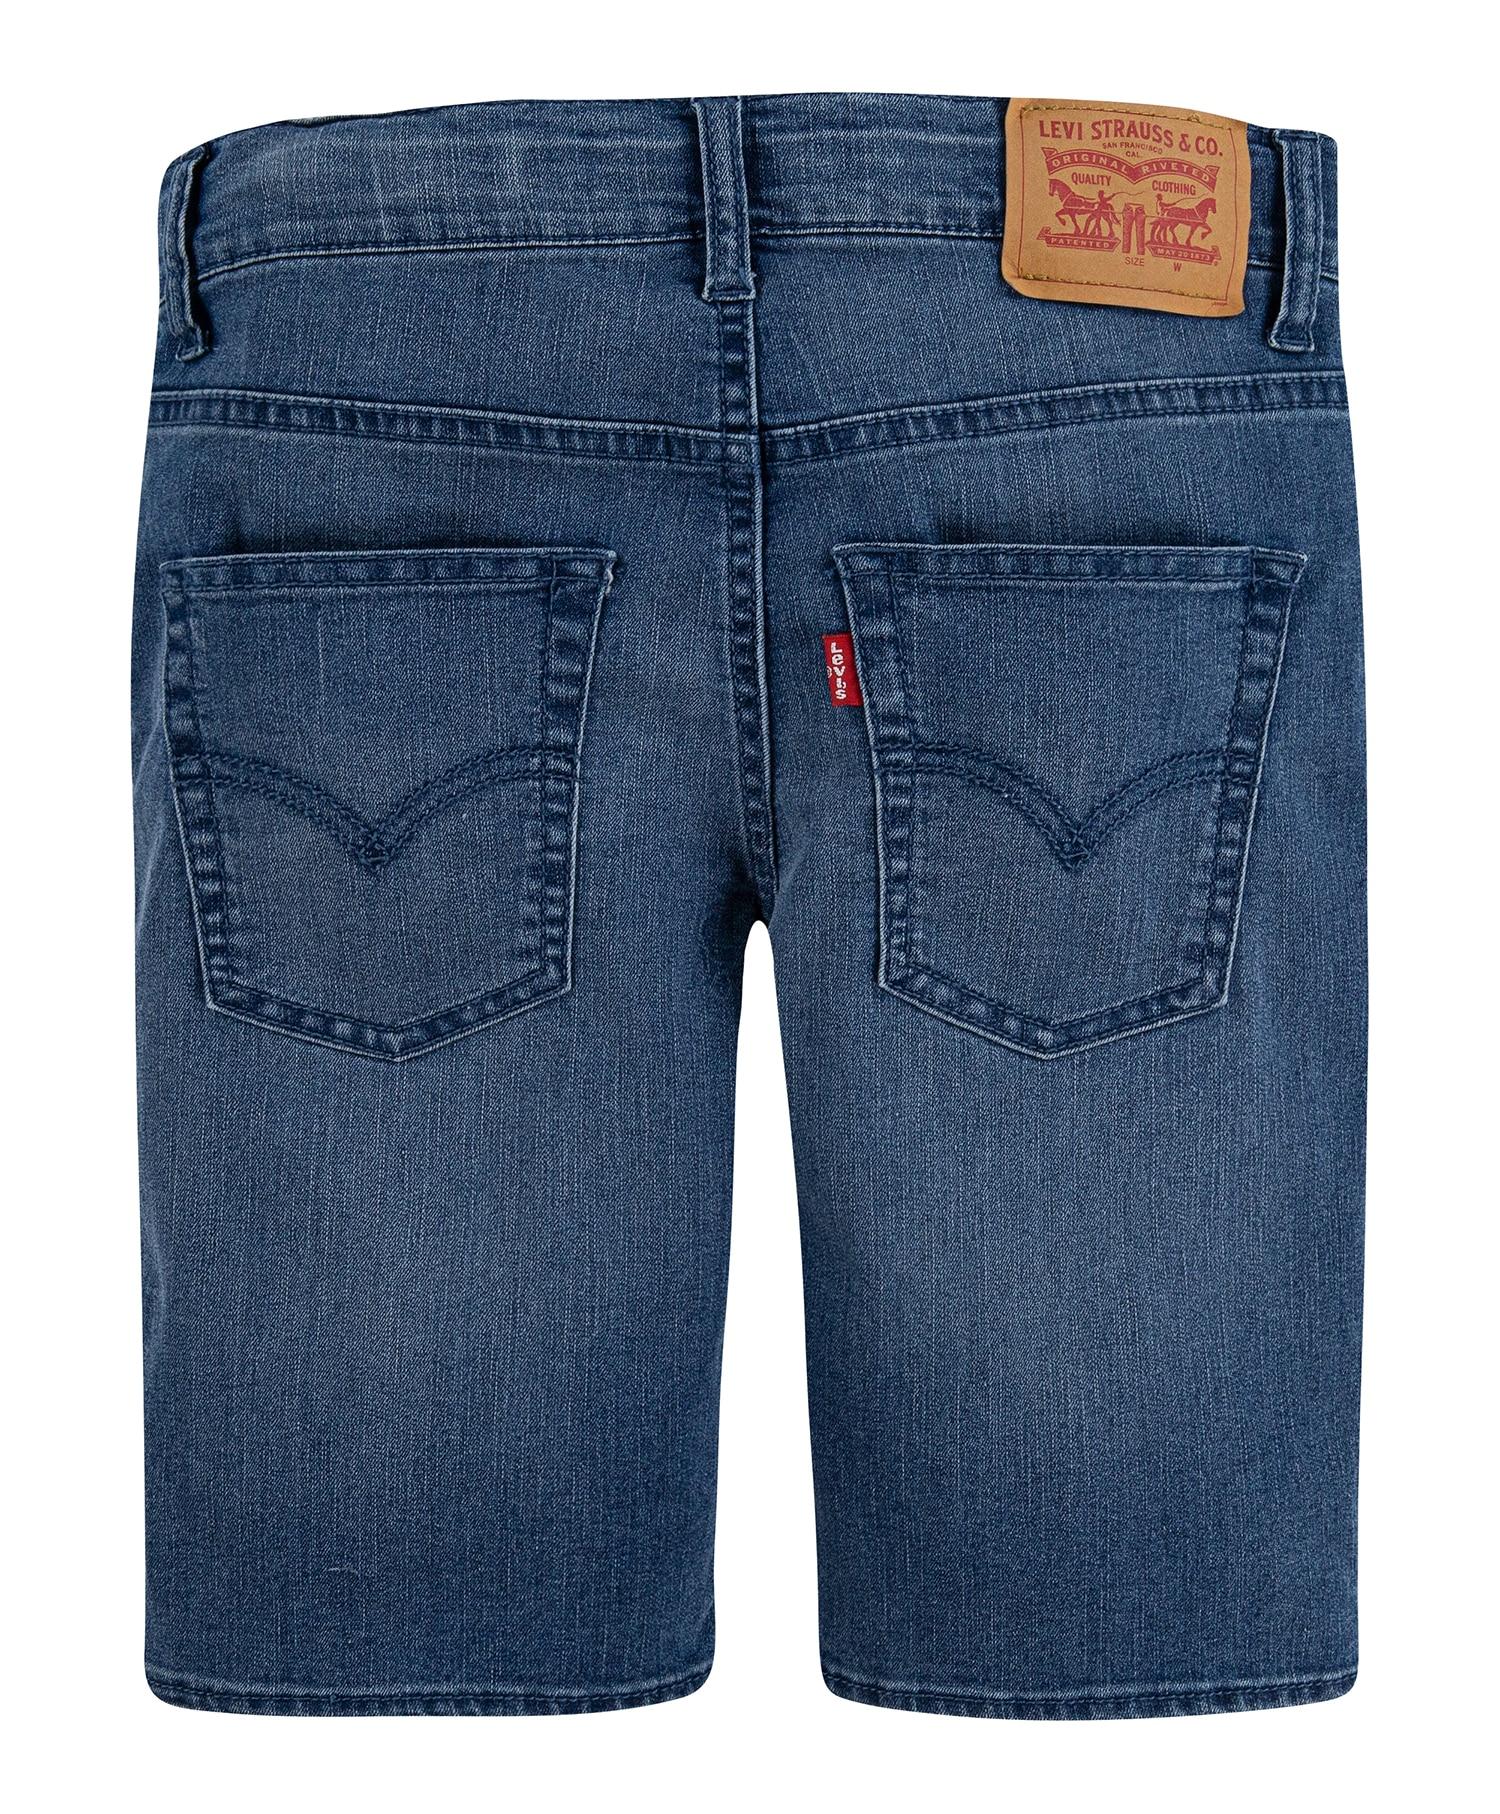 Levi's Jeans shorts 511